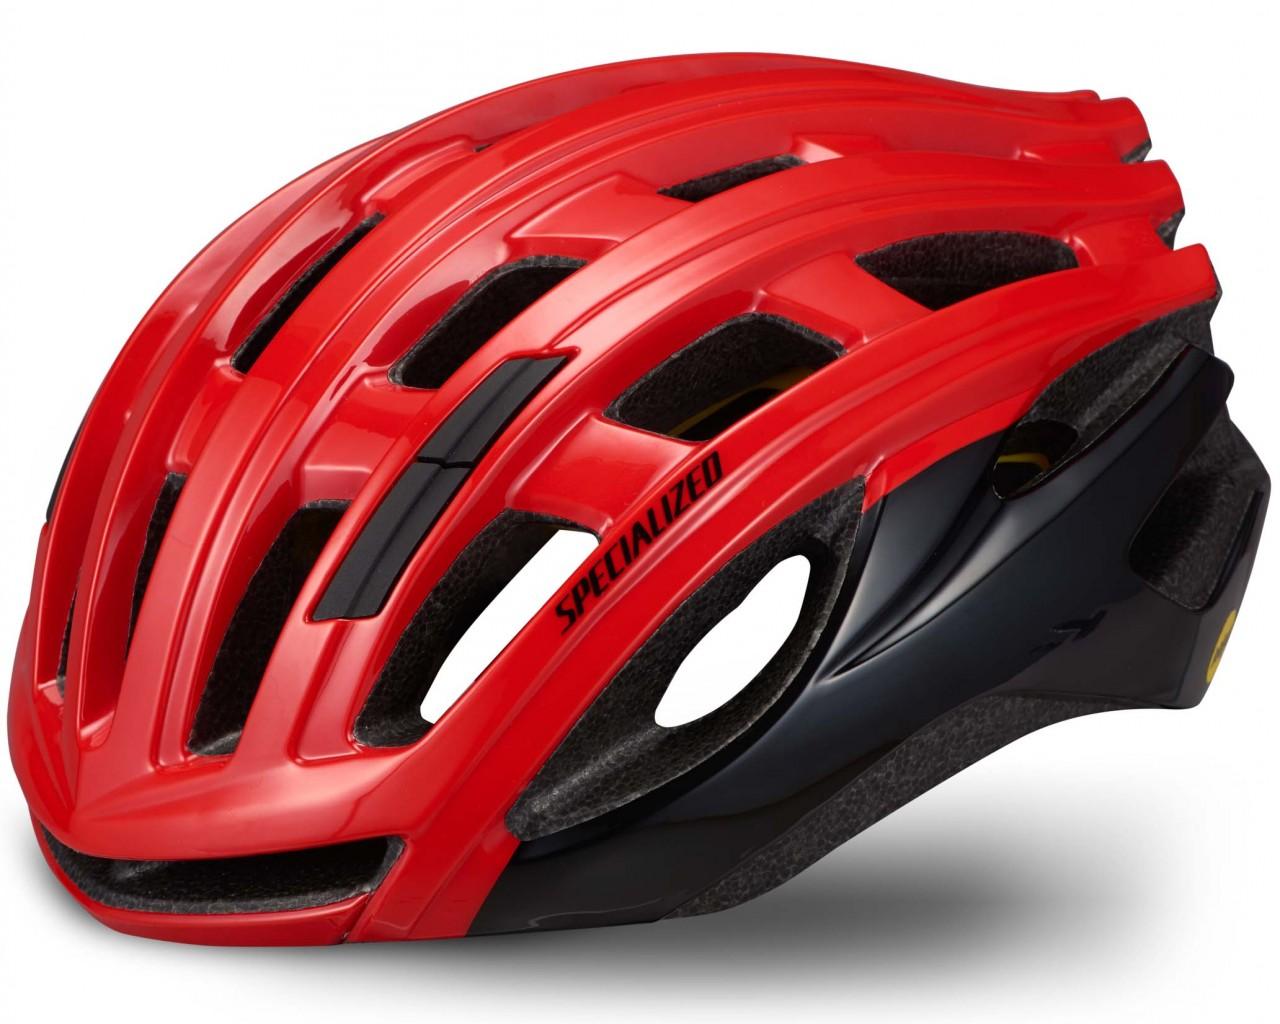 Specialized Propero III Rennrad Helm ANGi ready MIPS | flo red-tarmac black